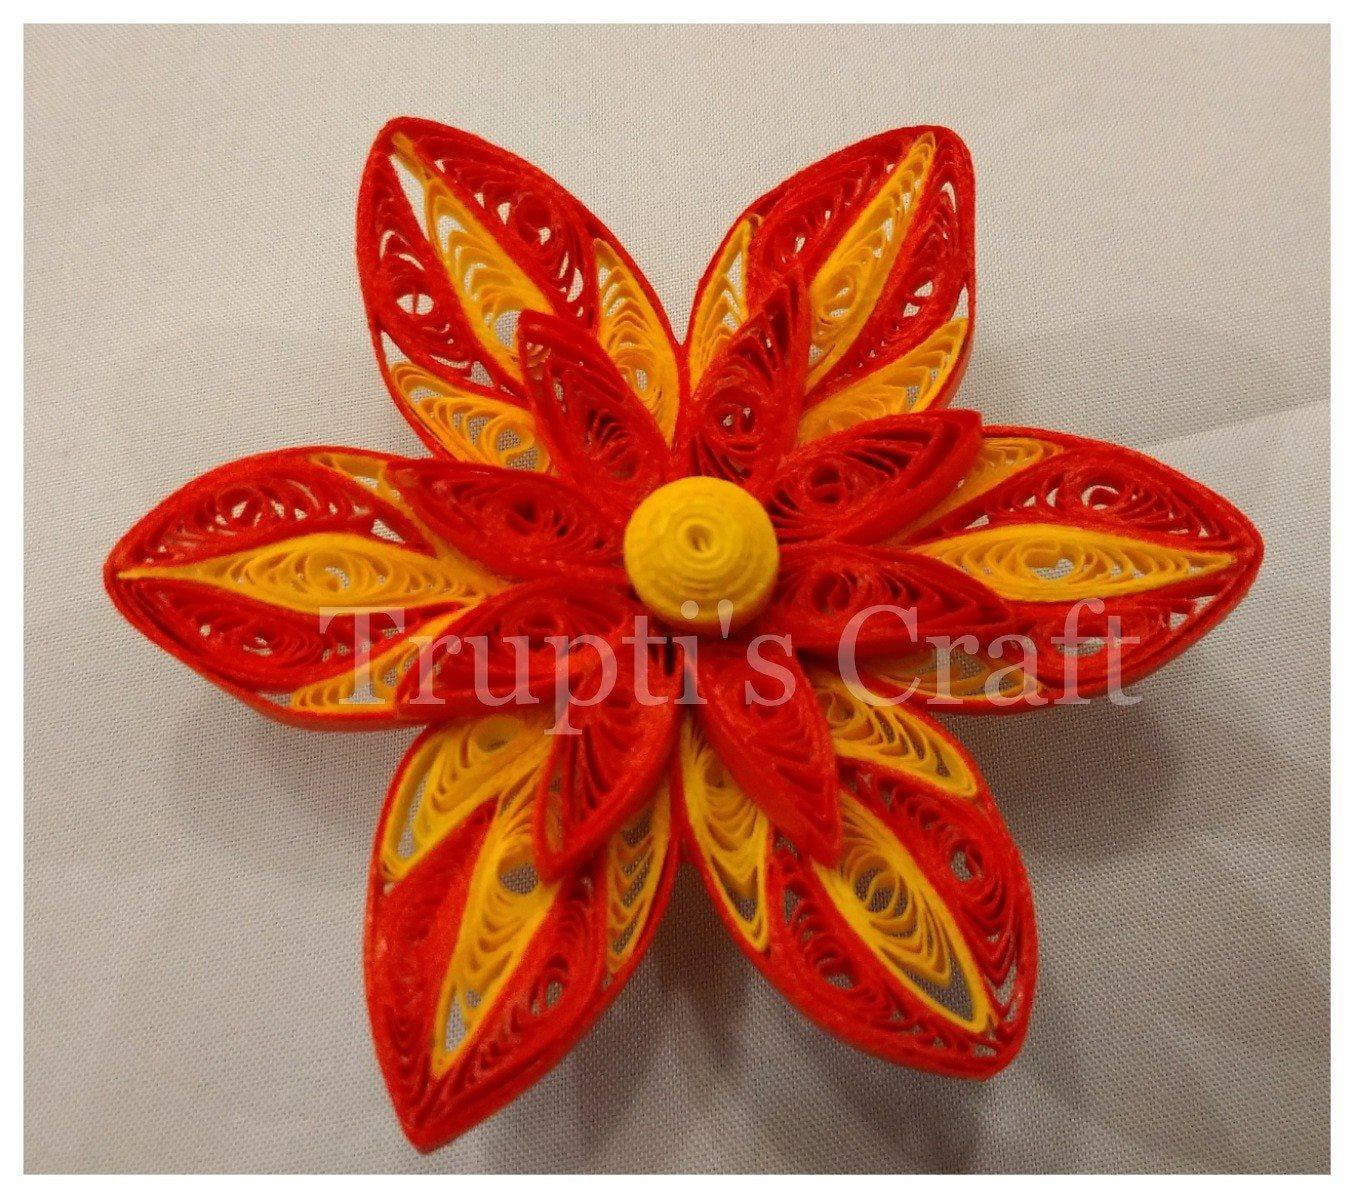 Truptis Craft Paper Quilling Flower Magnet